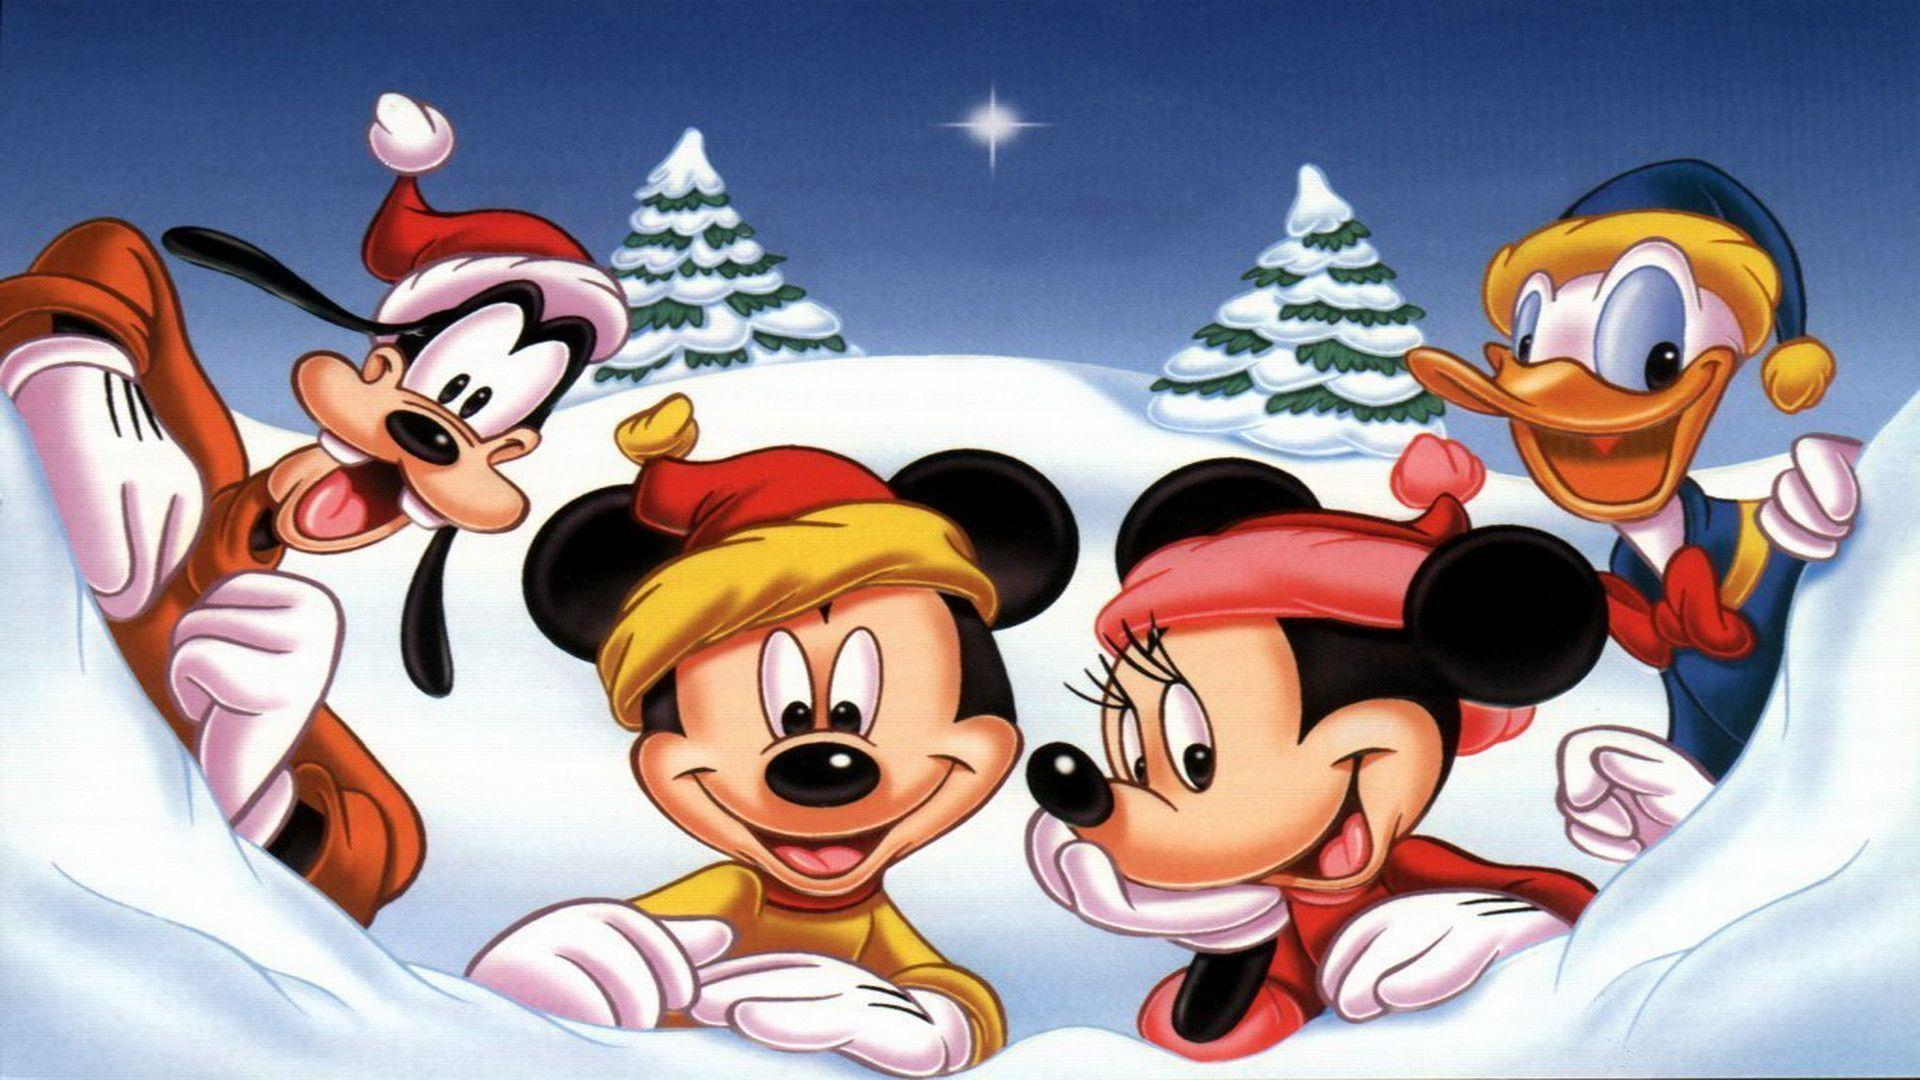 Disney Christmas Wallpapers - Wallpaper Cave